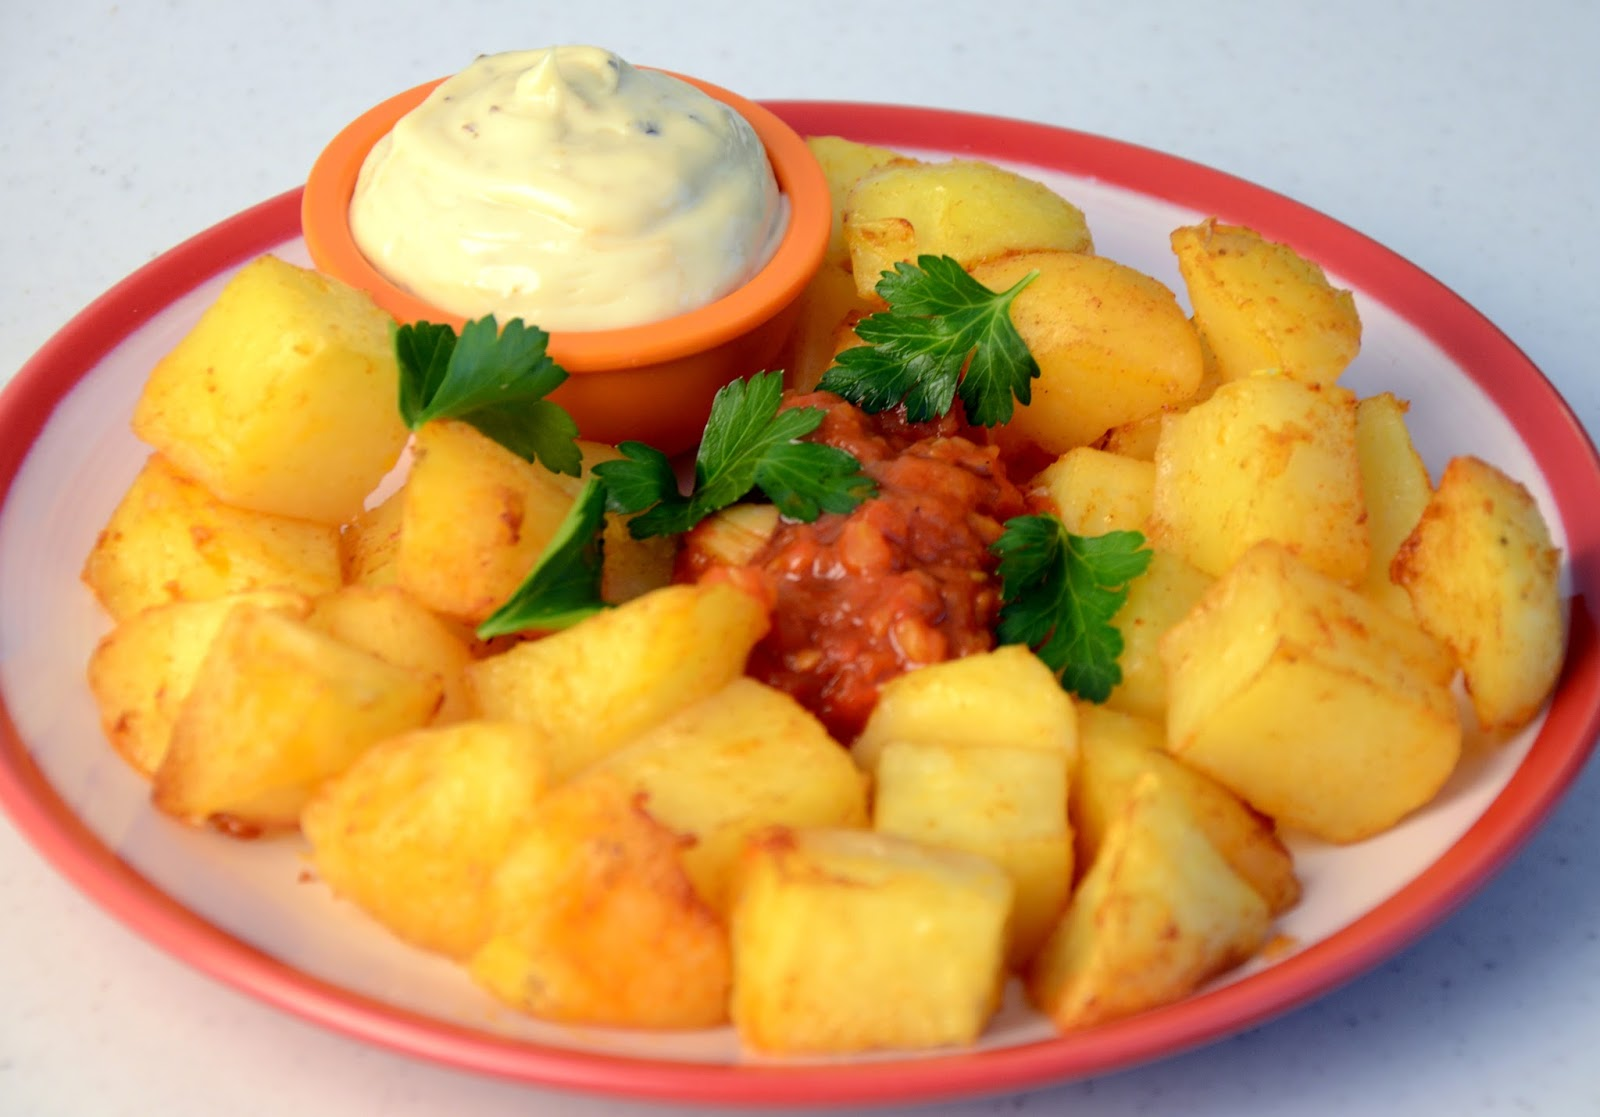 Fried Potatoes With Spicy Salsa And Mayo ~ Batatas Bravas